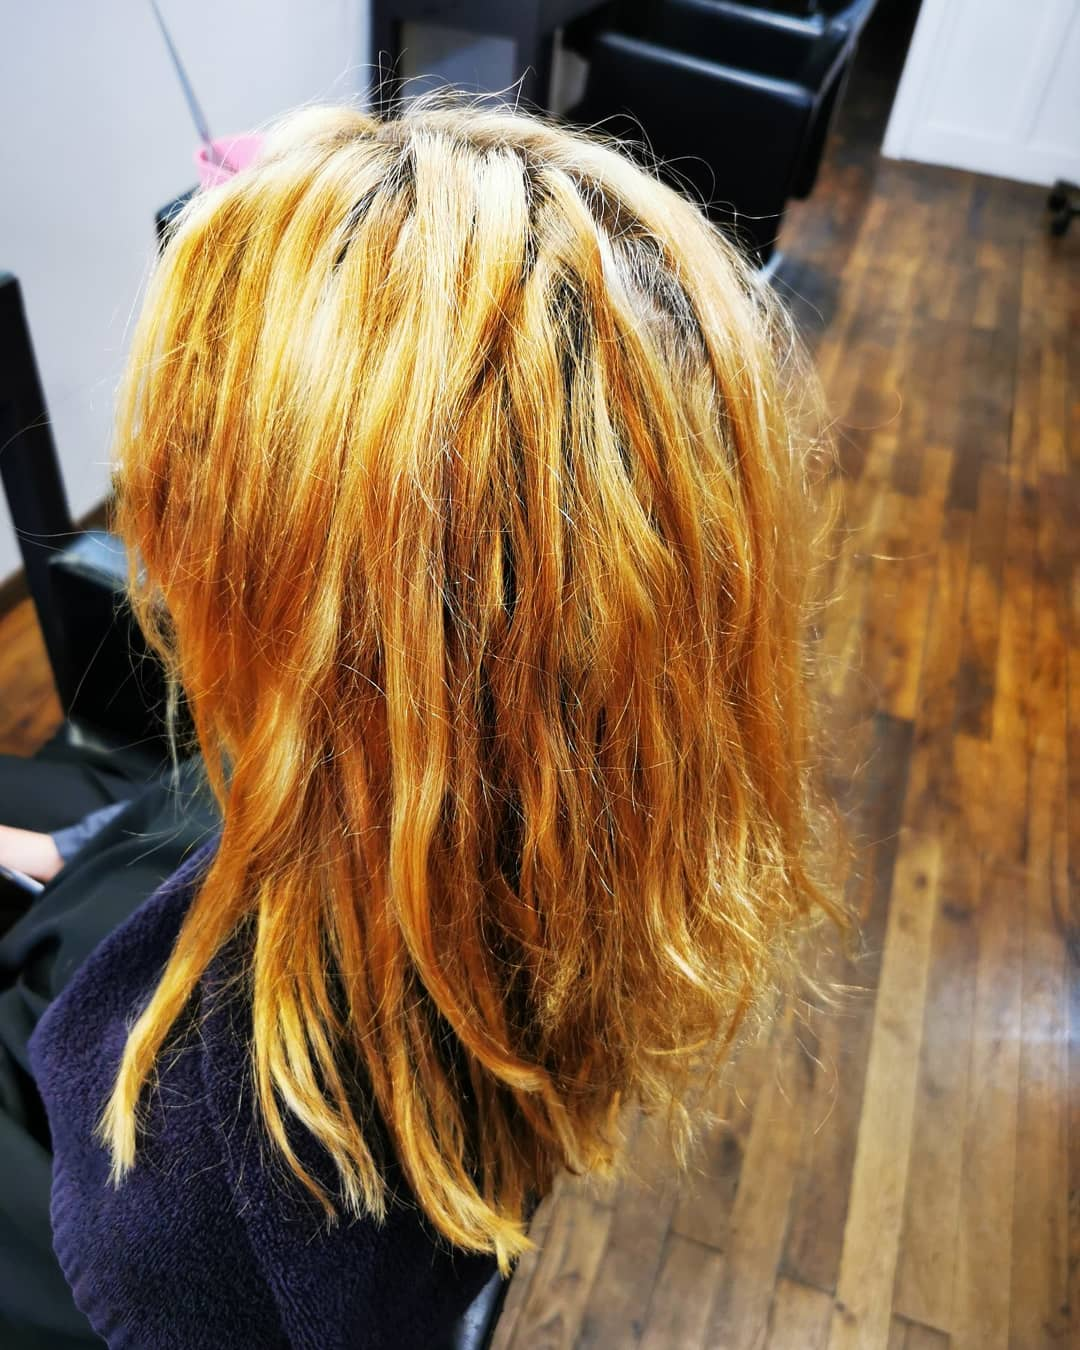 Salon Expert Du Blond A Nantes Meches Balayage